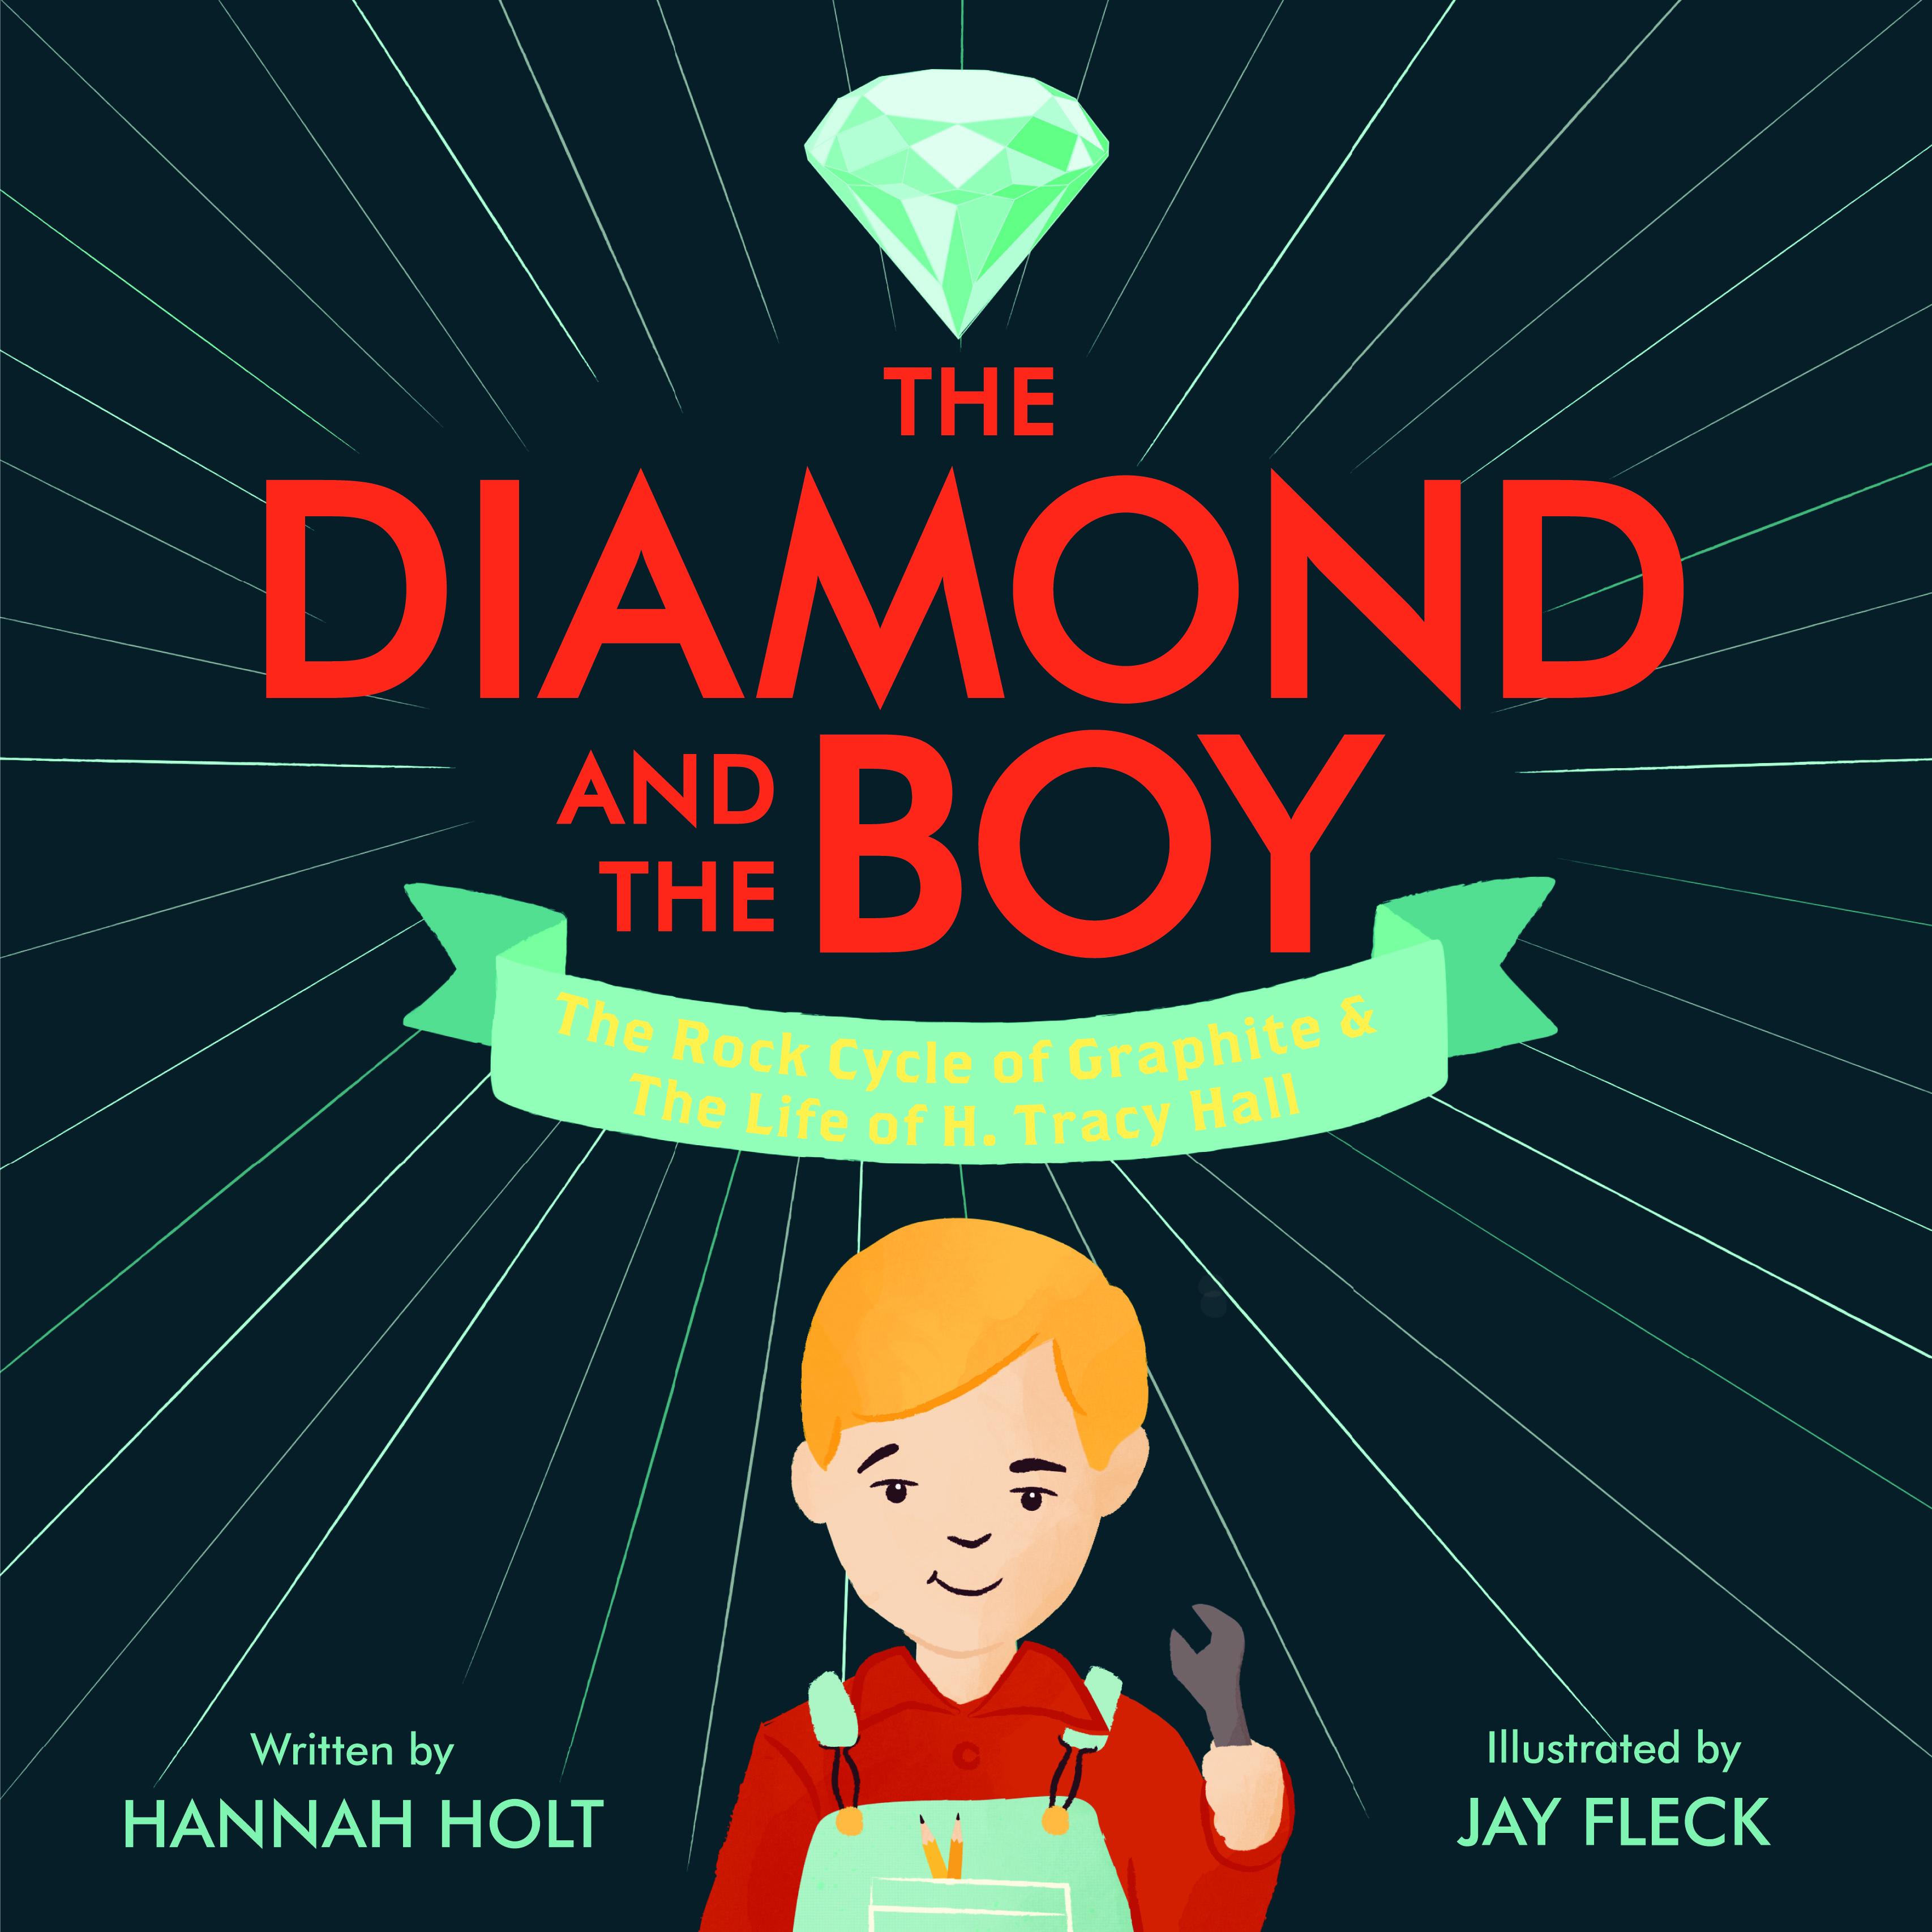 THE DIAMOND & THE BOY